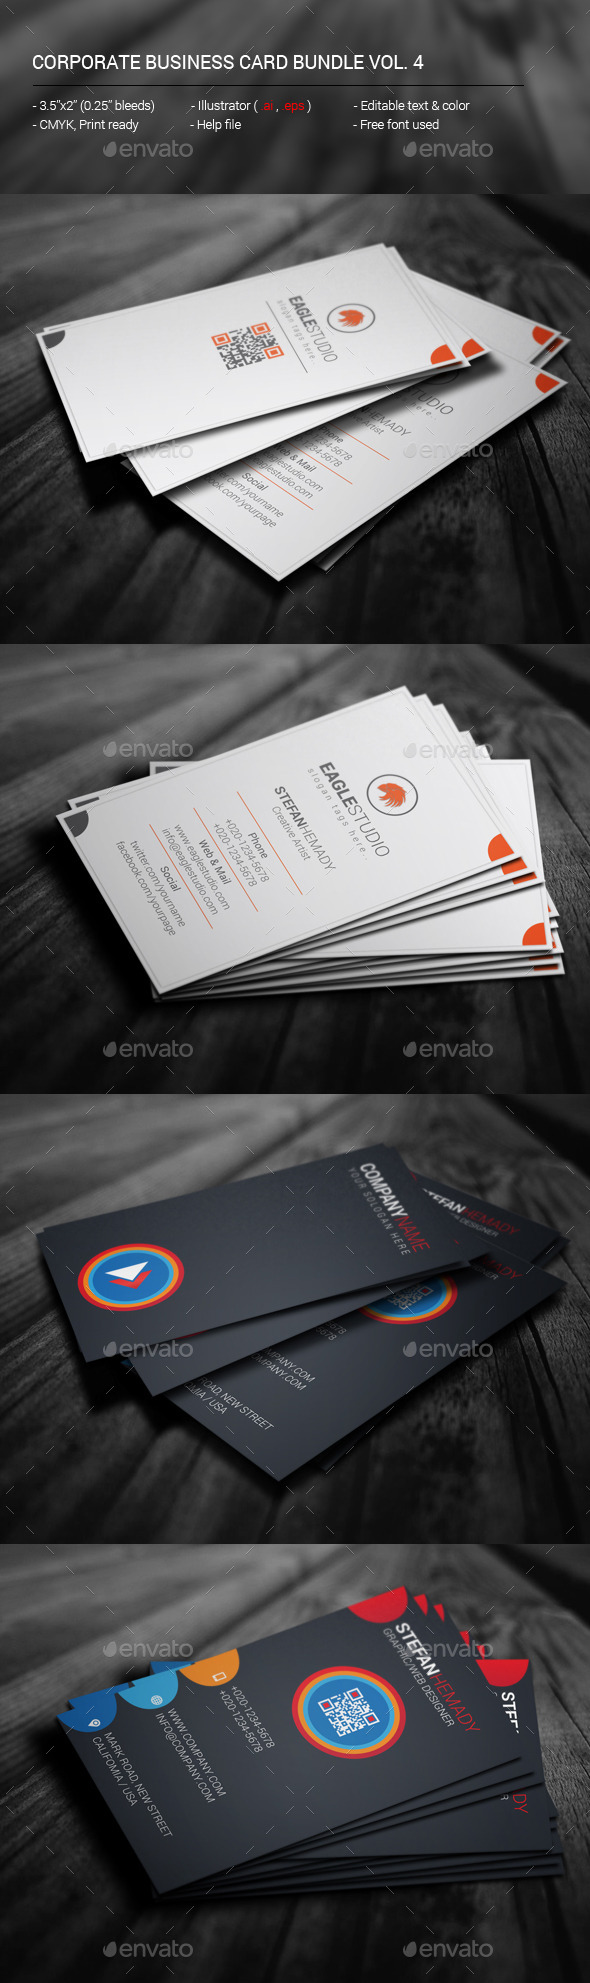 Corporate Business Card Bundle Vol. 4 - Corporate Business Cards